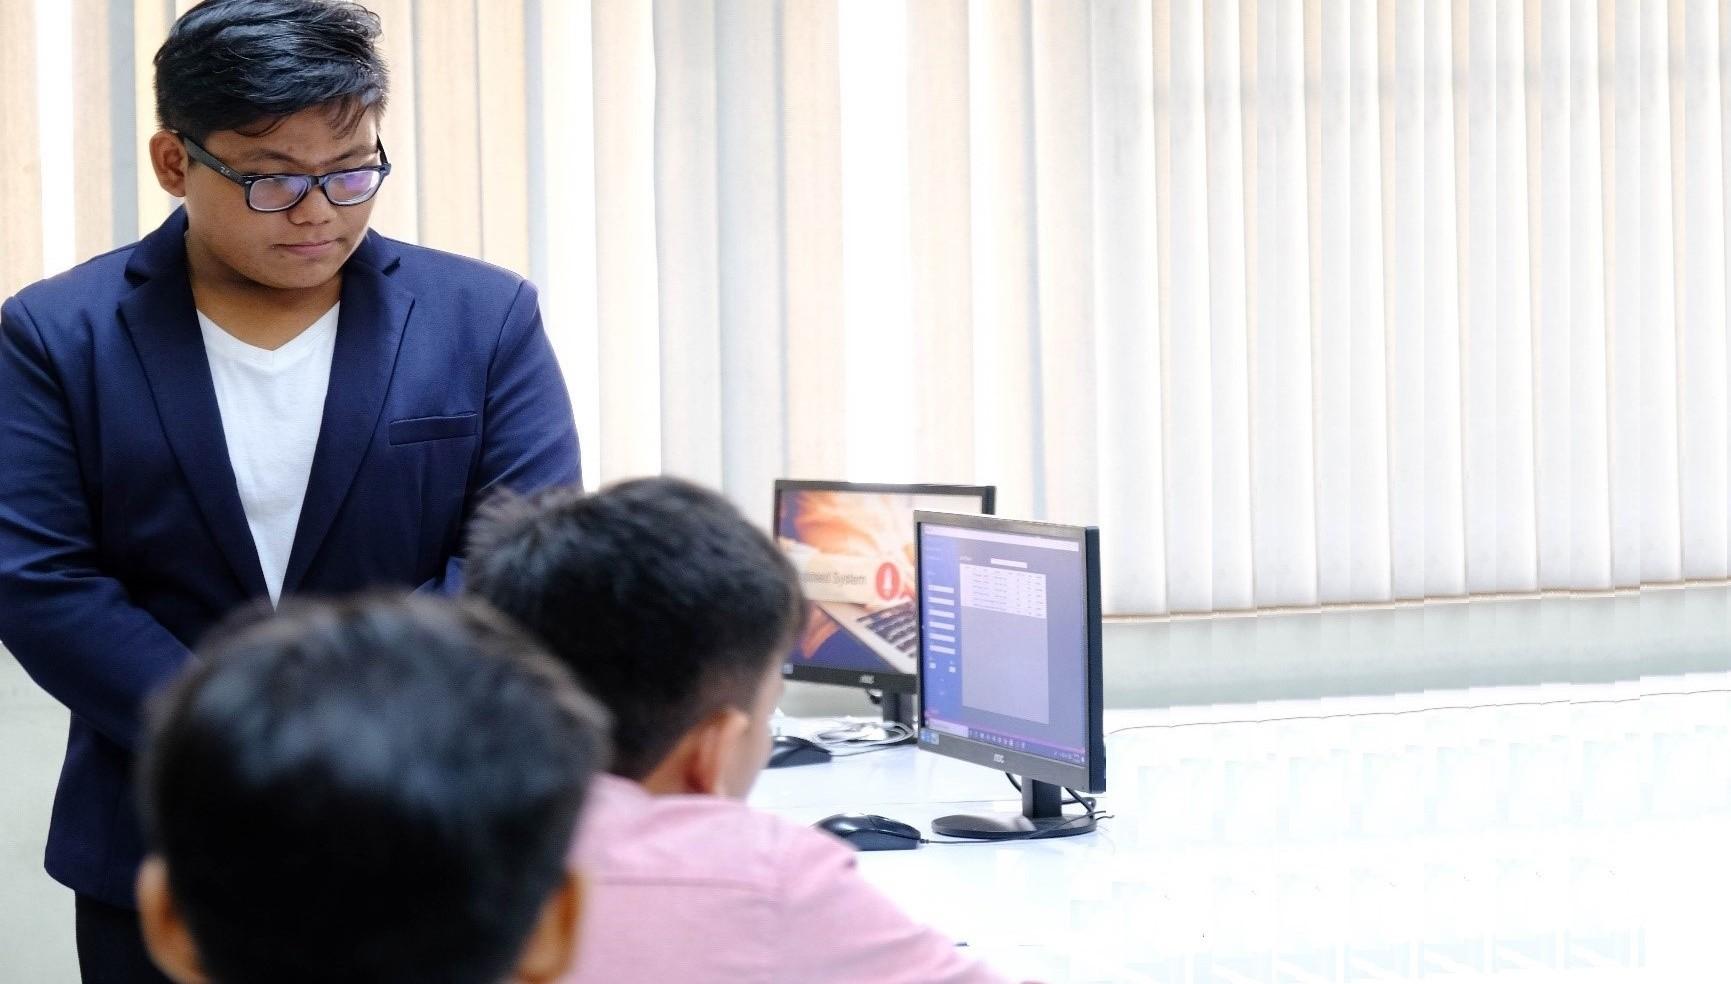 ERNI Social Project scholars completes IT Education training